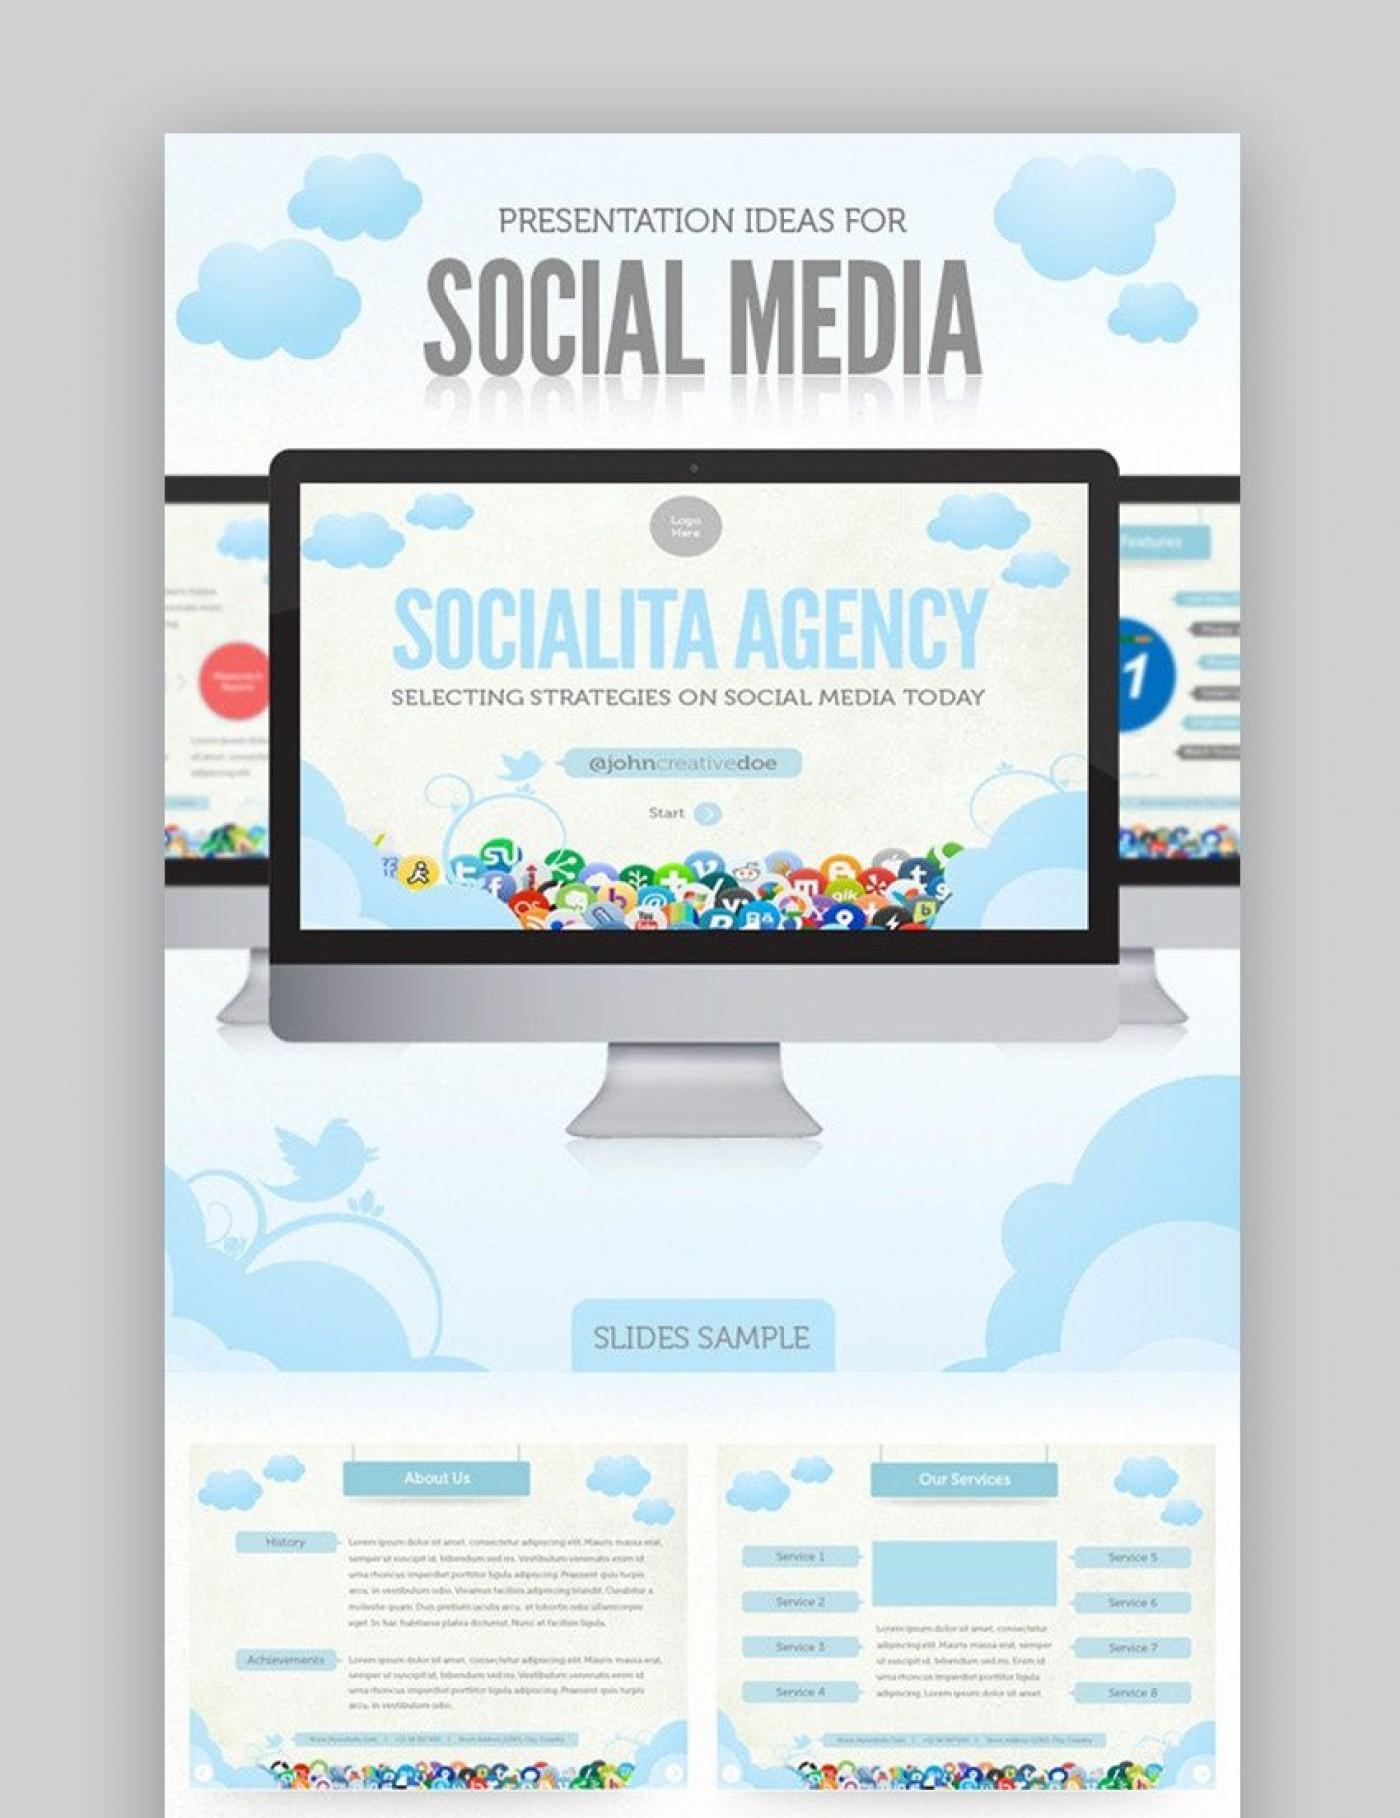 007 Marvelou Social Media Proposal Template Ppt High Definition 1400